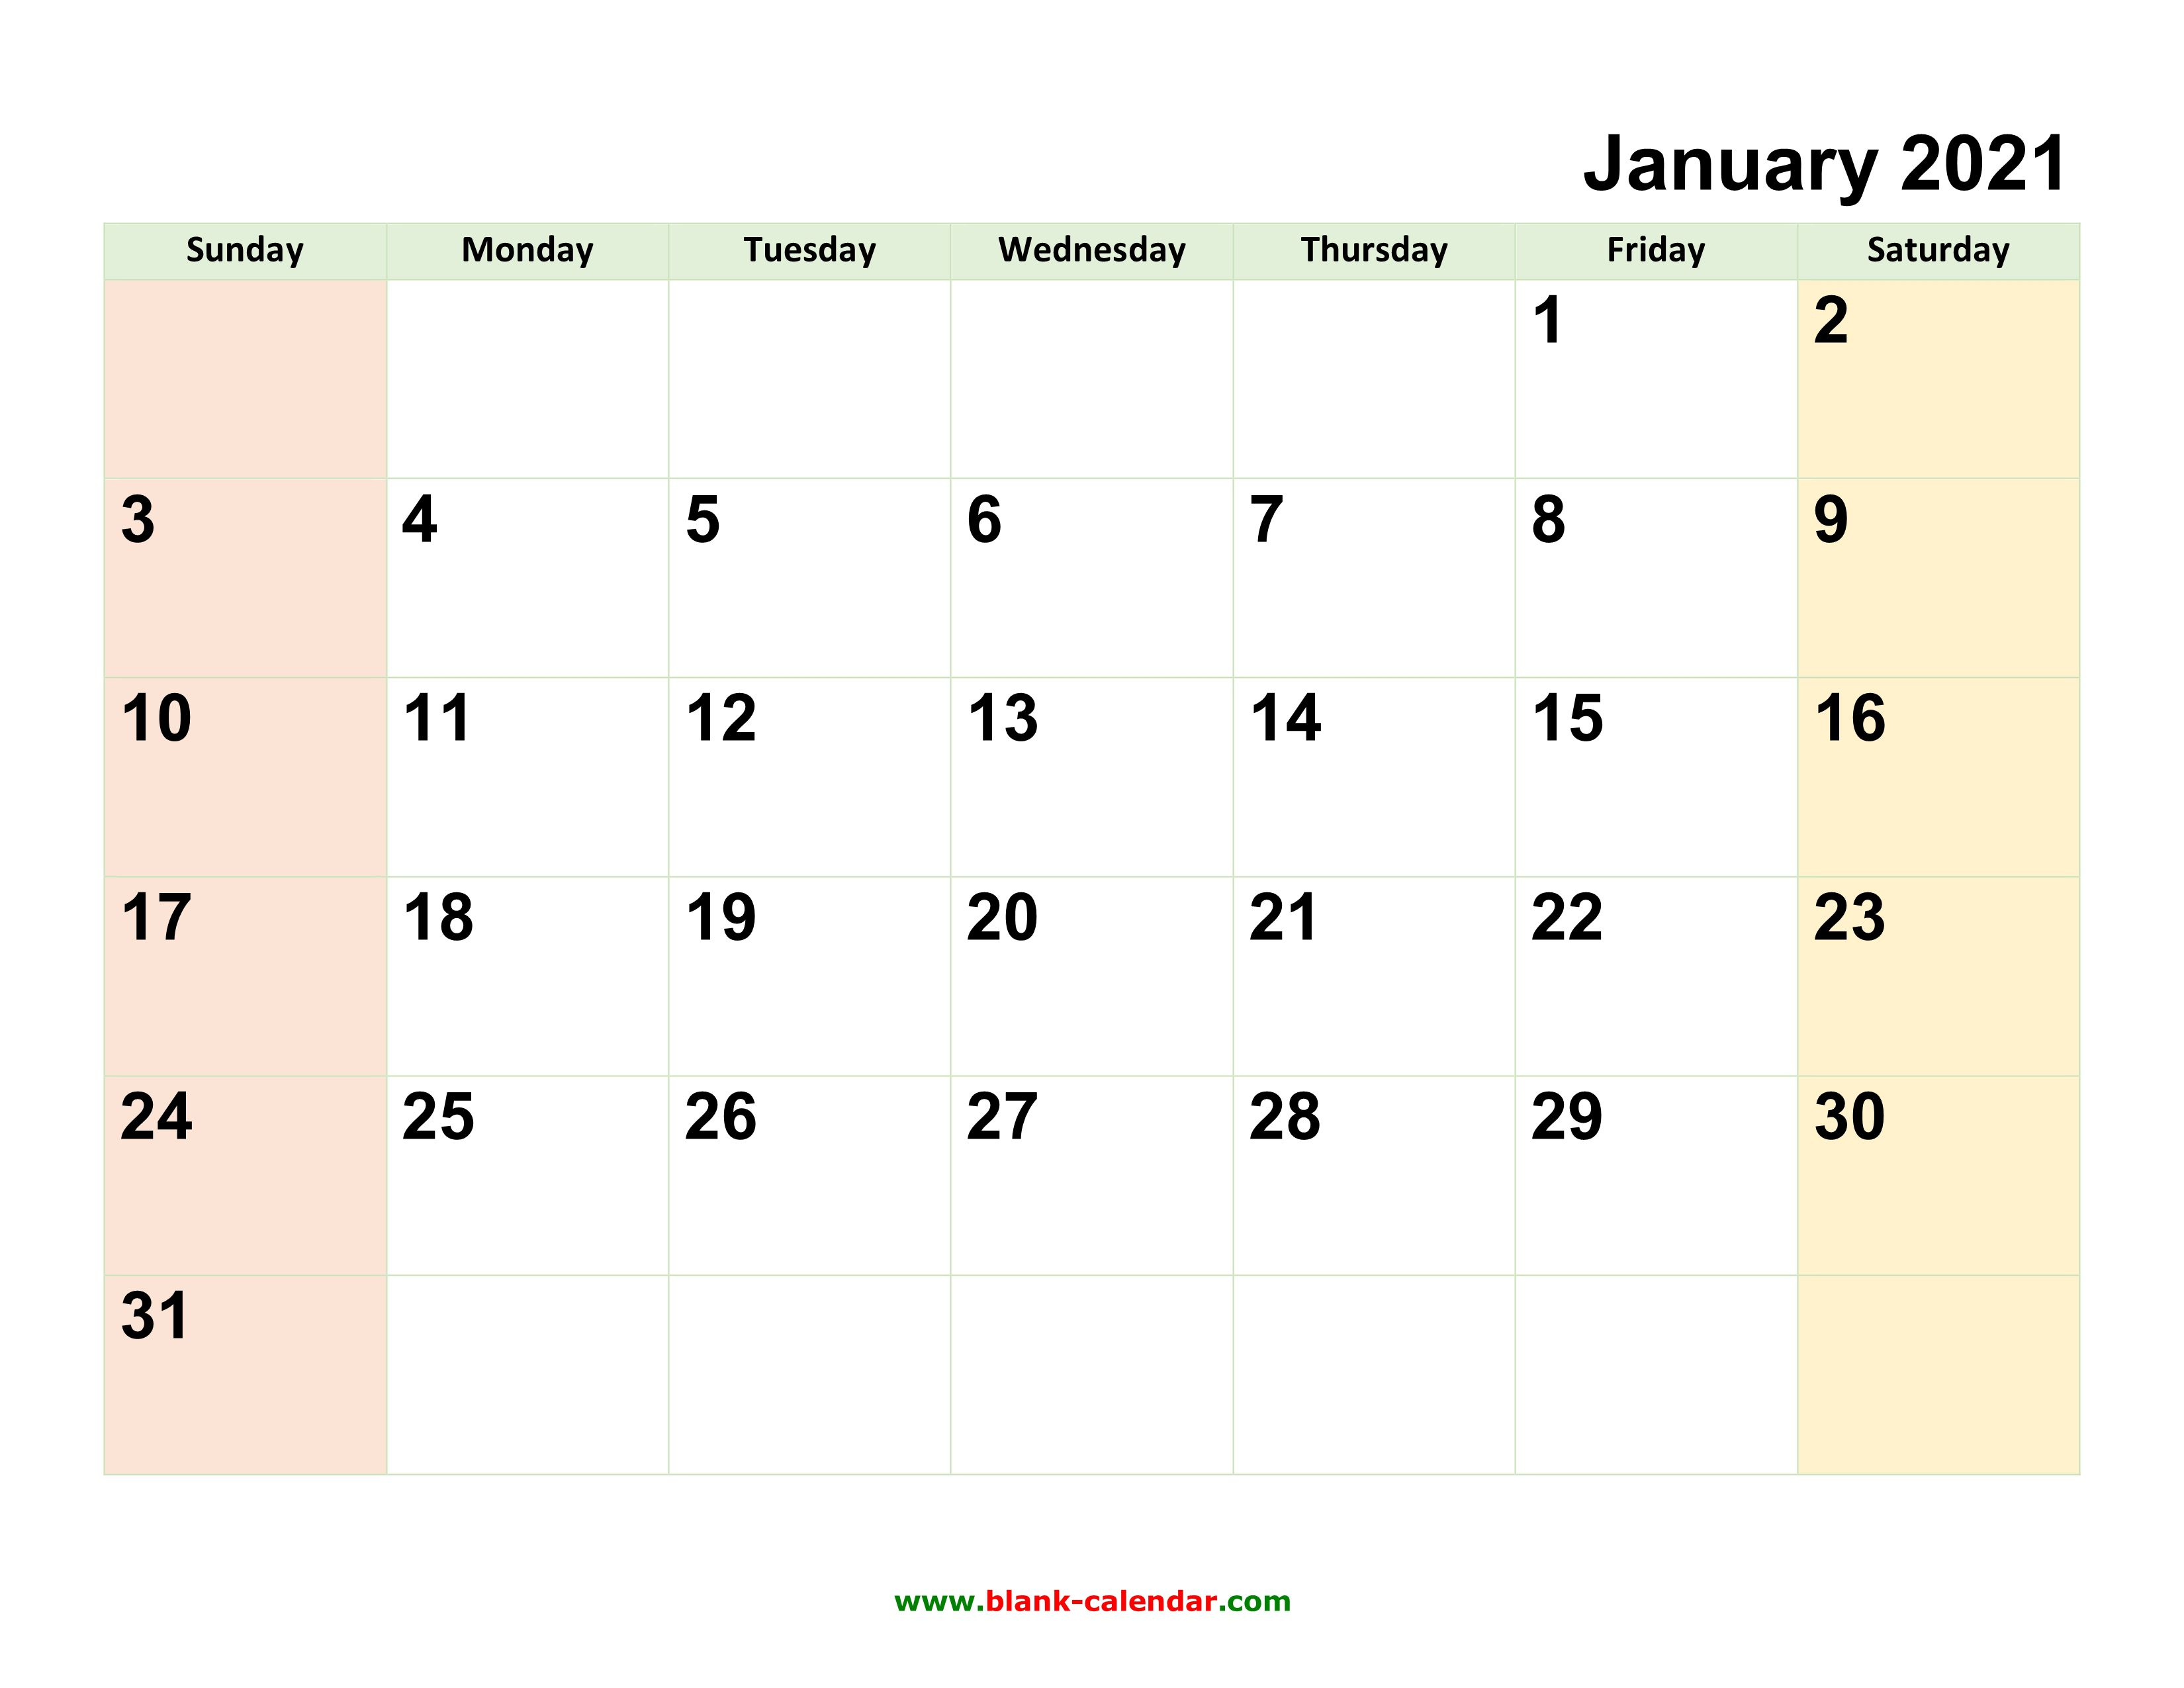 003 Formidable Google Doc Weekly Calendar Template 2021 Photo  FreeFull